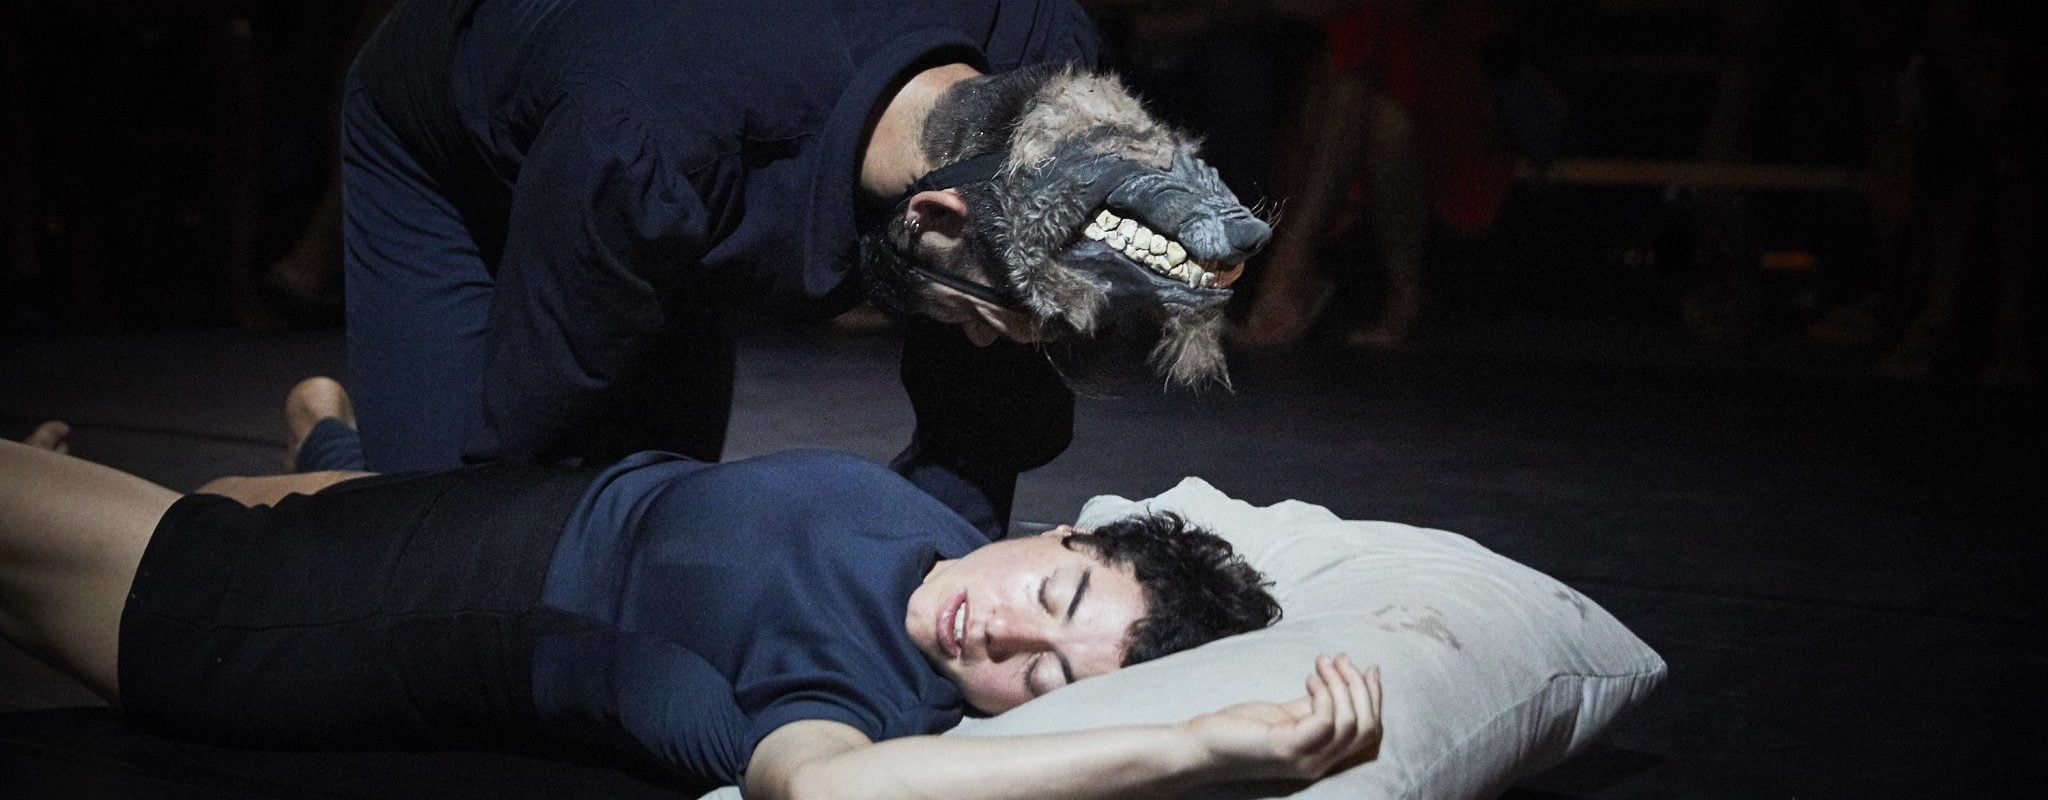 Strach, le cirque qui explore la peur au Maillon